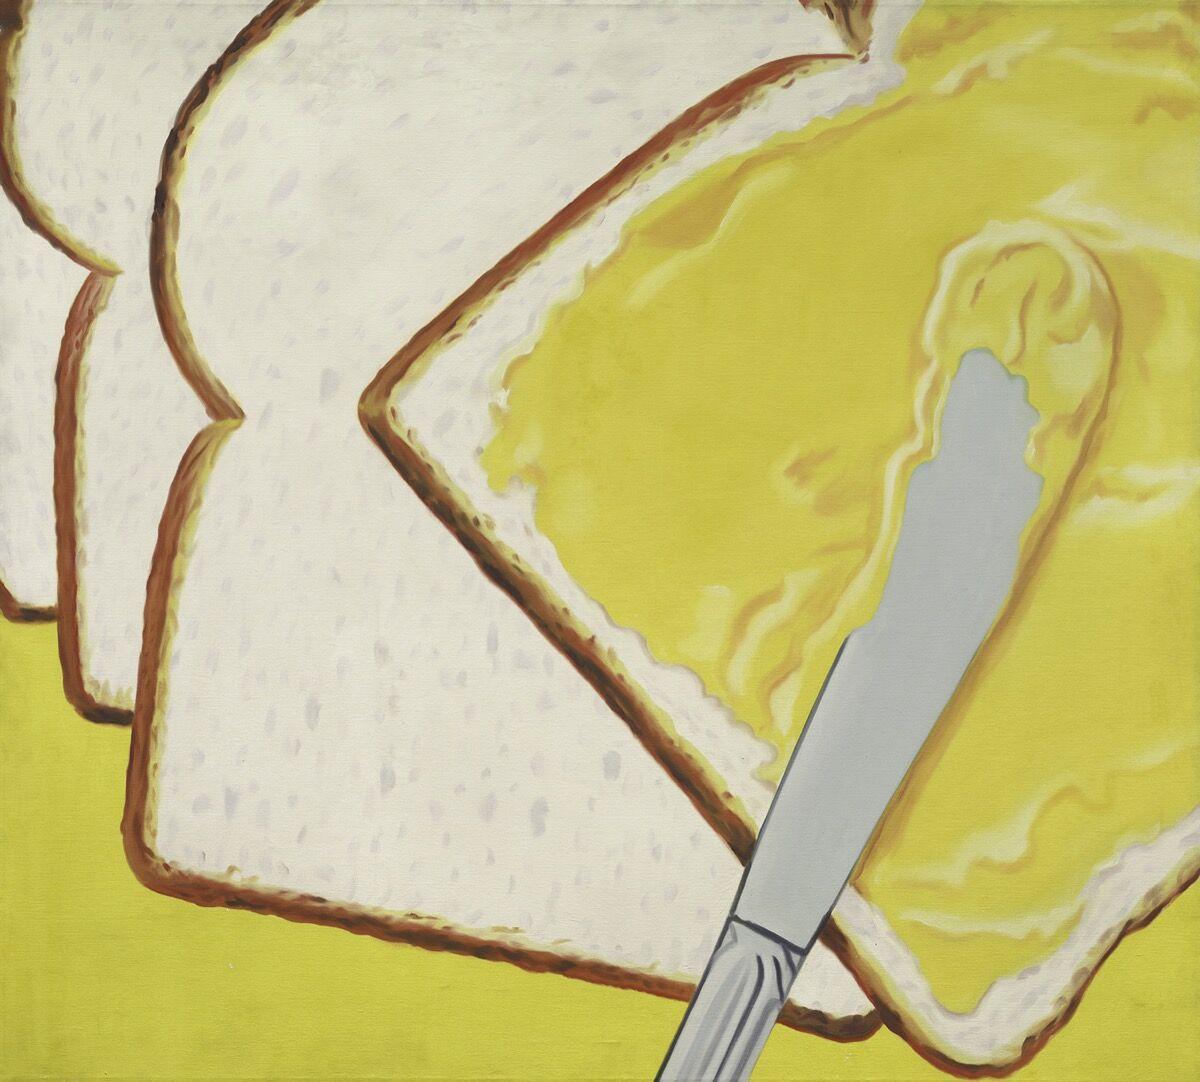 James Rosenquist, White Bread, 1964. © Estate of James Rosenquist / Licensed by VAGA at ARS, New York. Courtesy of Acquavella Galleries.